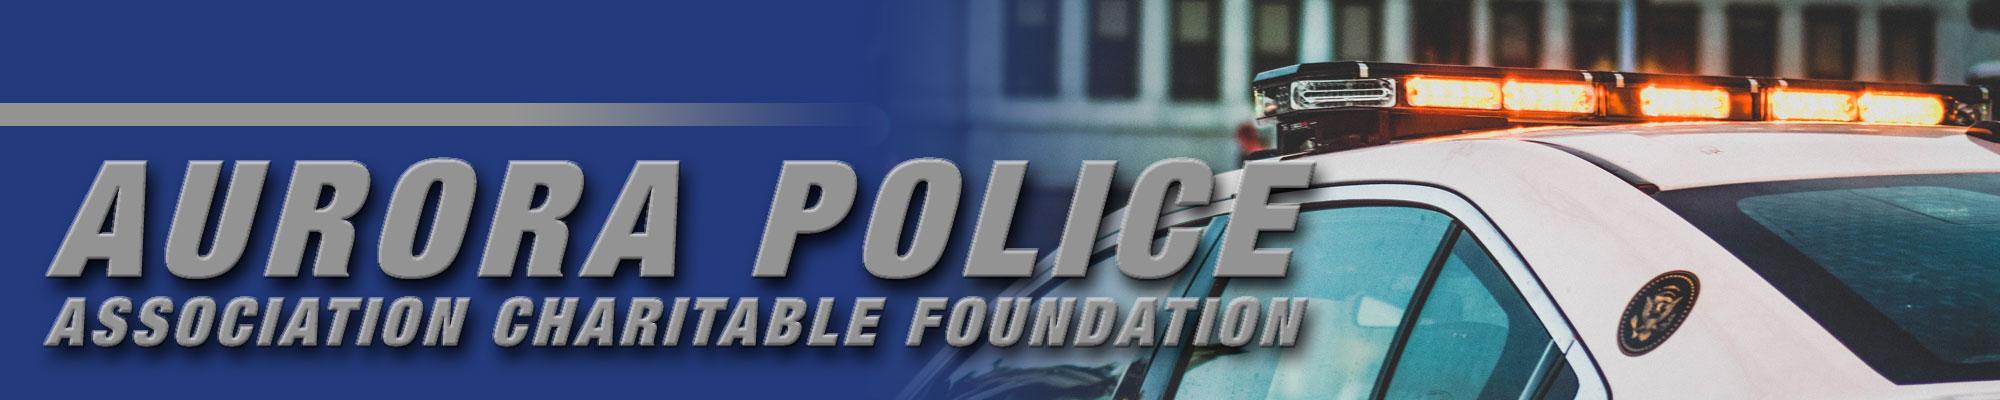 Aurora Police Association Charitable Foundation